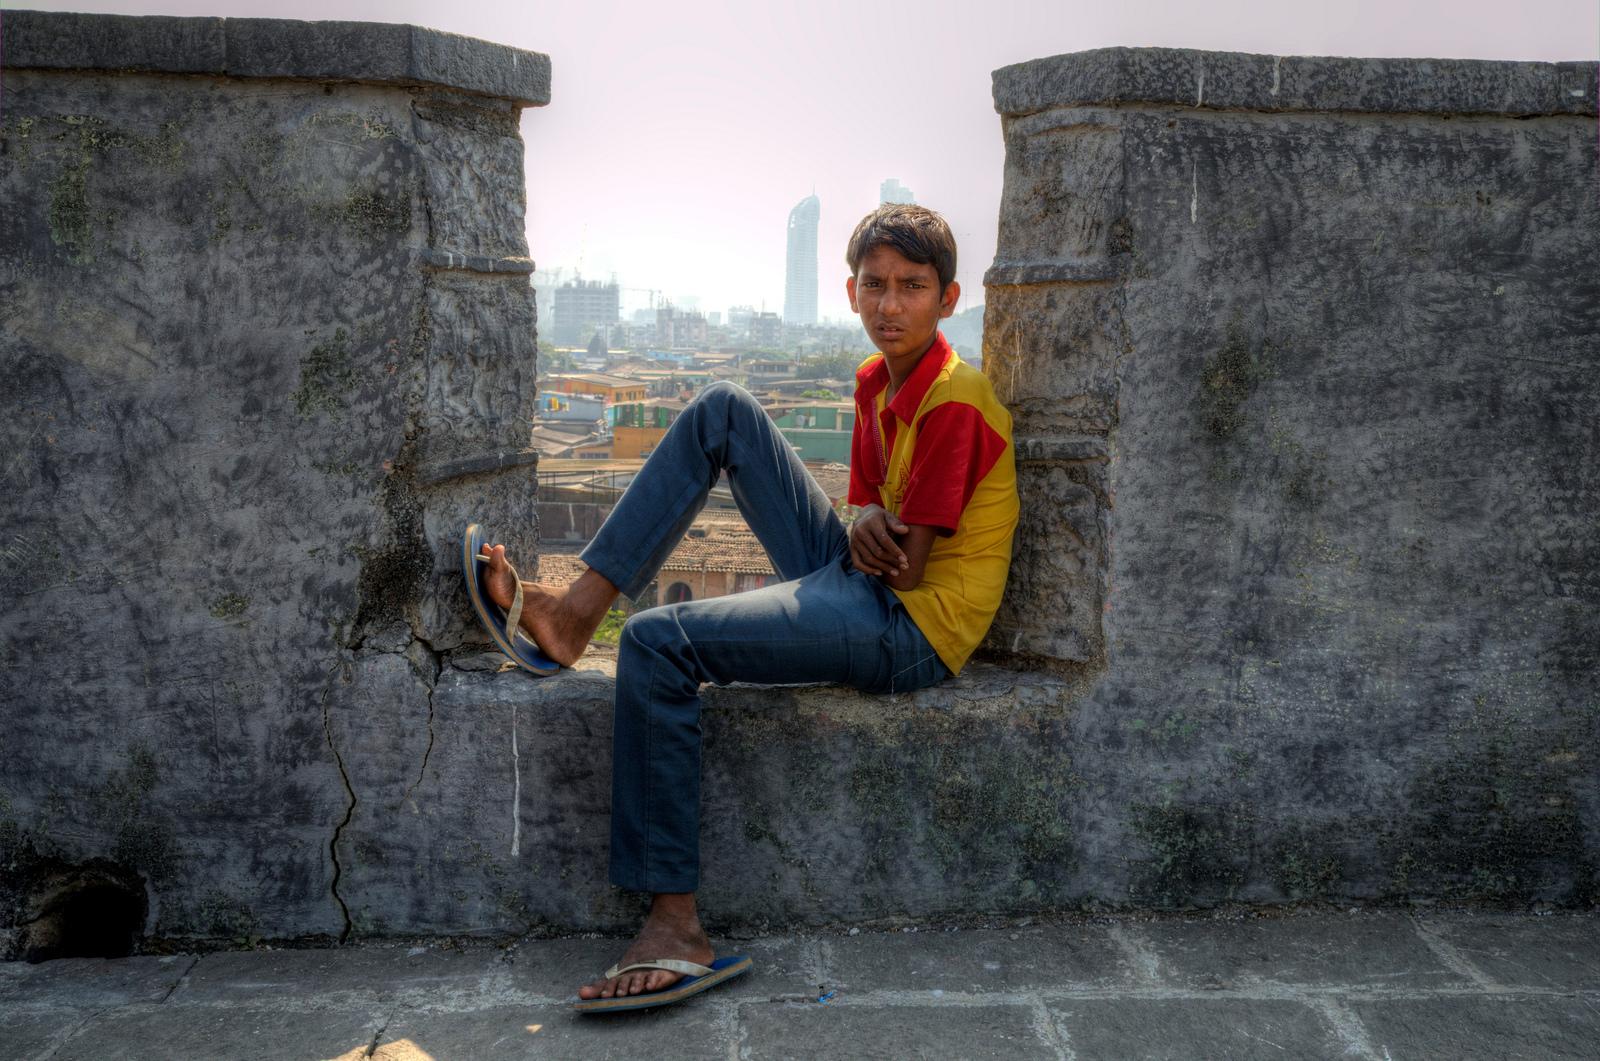 Boy in Mumbai, India